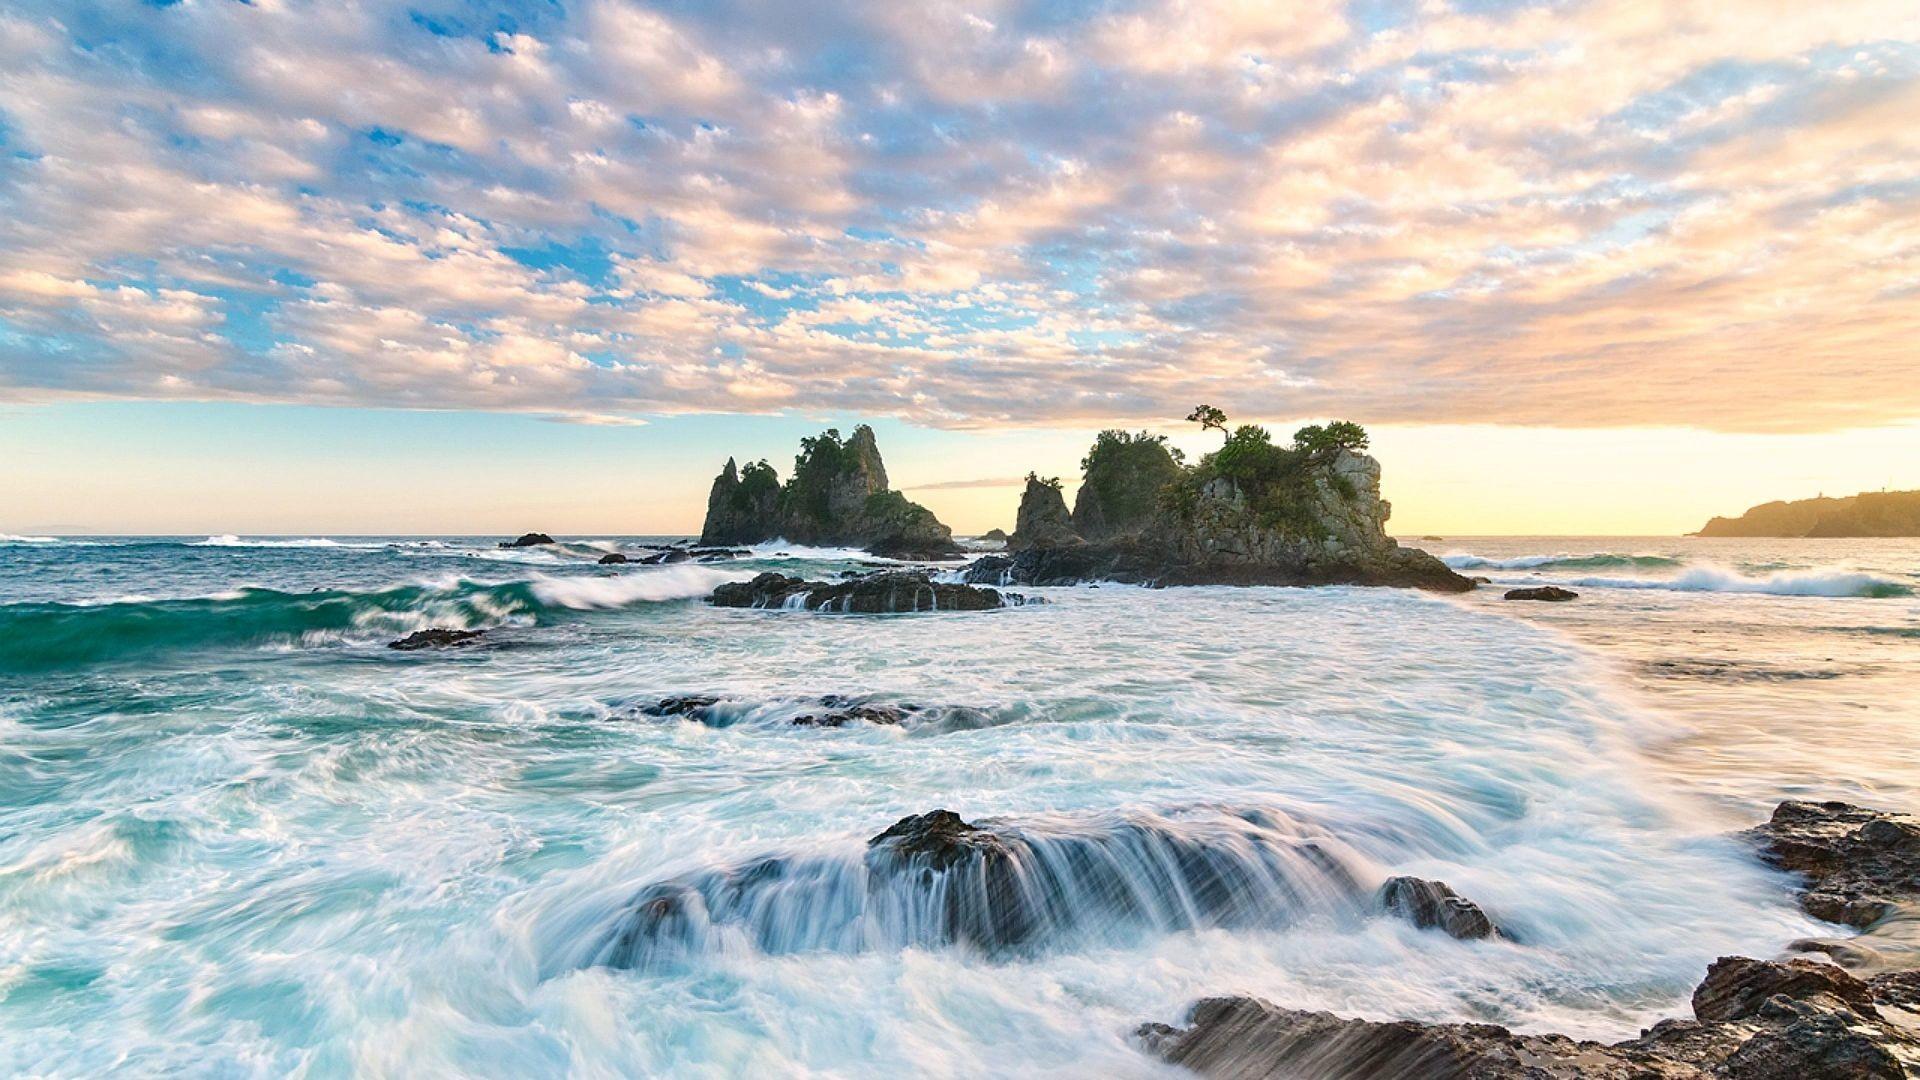 Sunrise On The Japanese Coast Beach Nature Hd Wallpaper   HD Beach Wallpaper  Free Download …